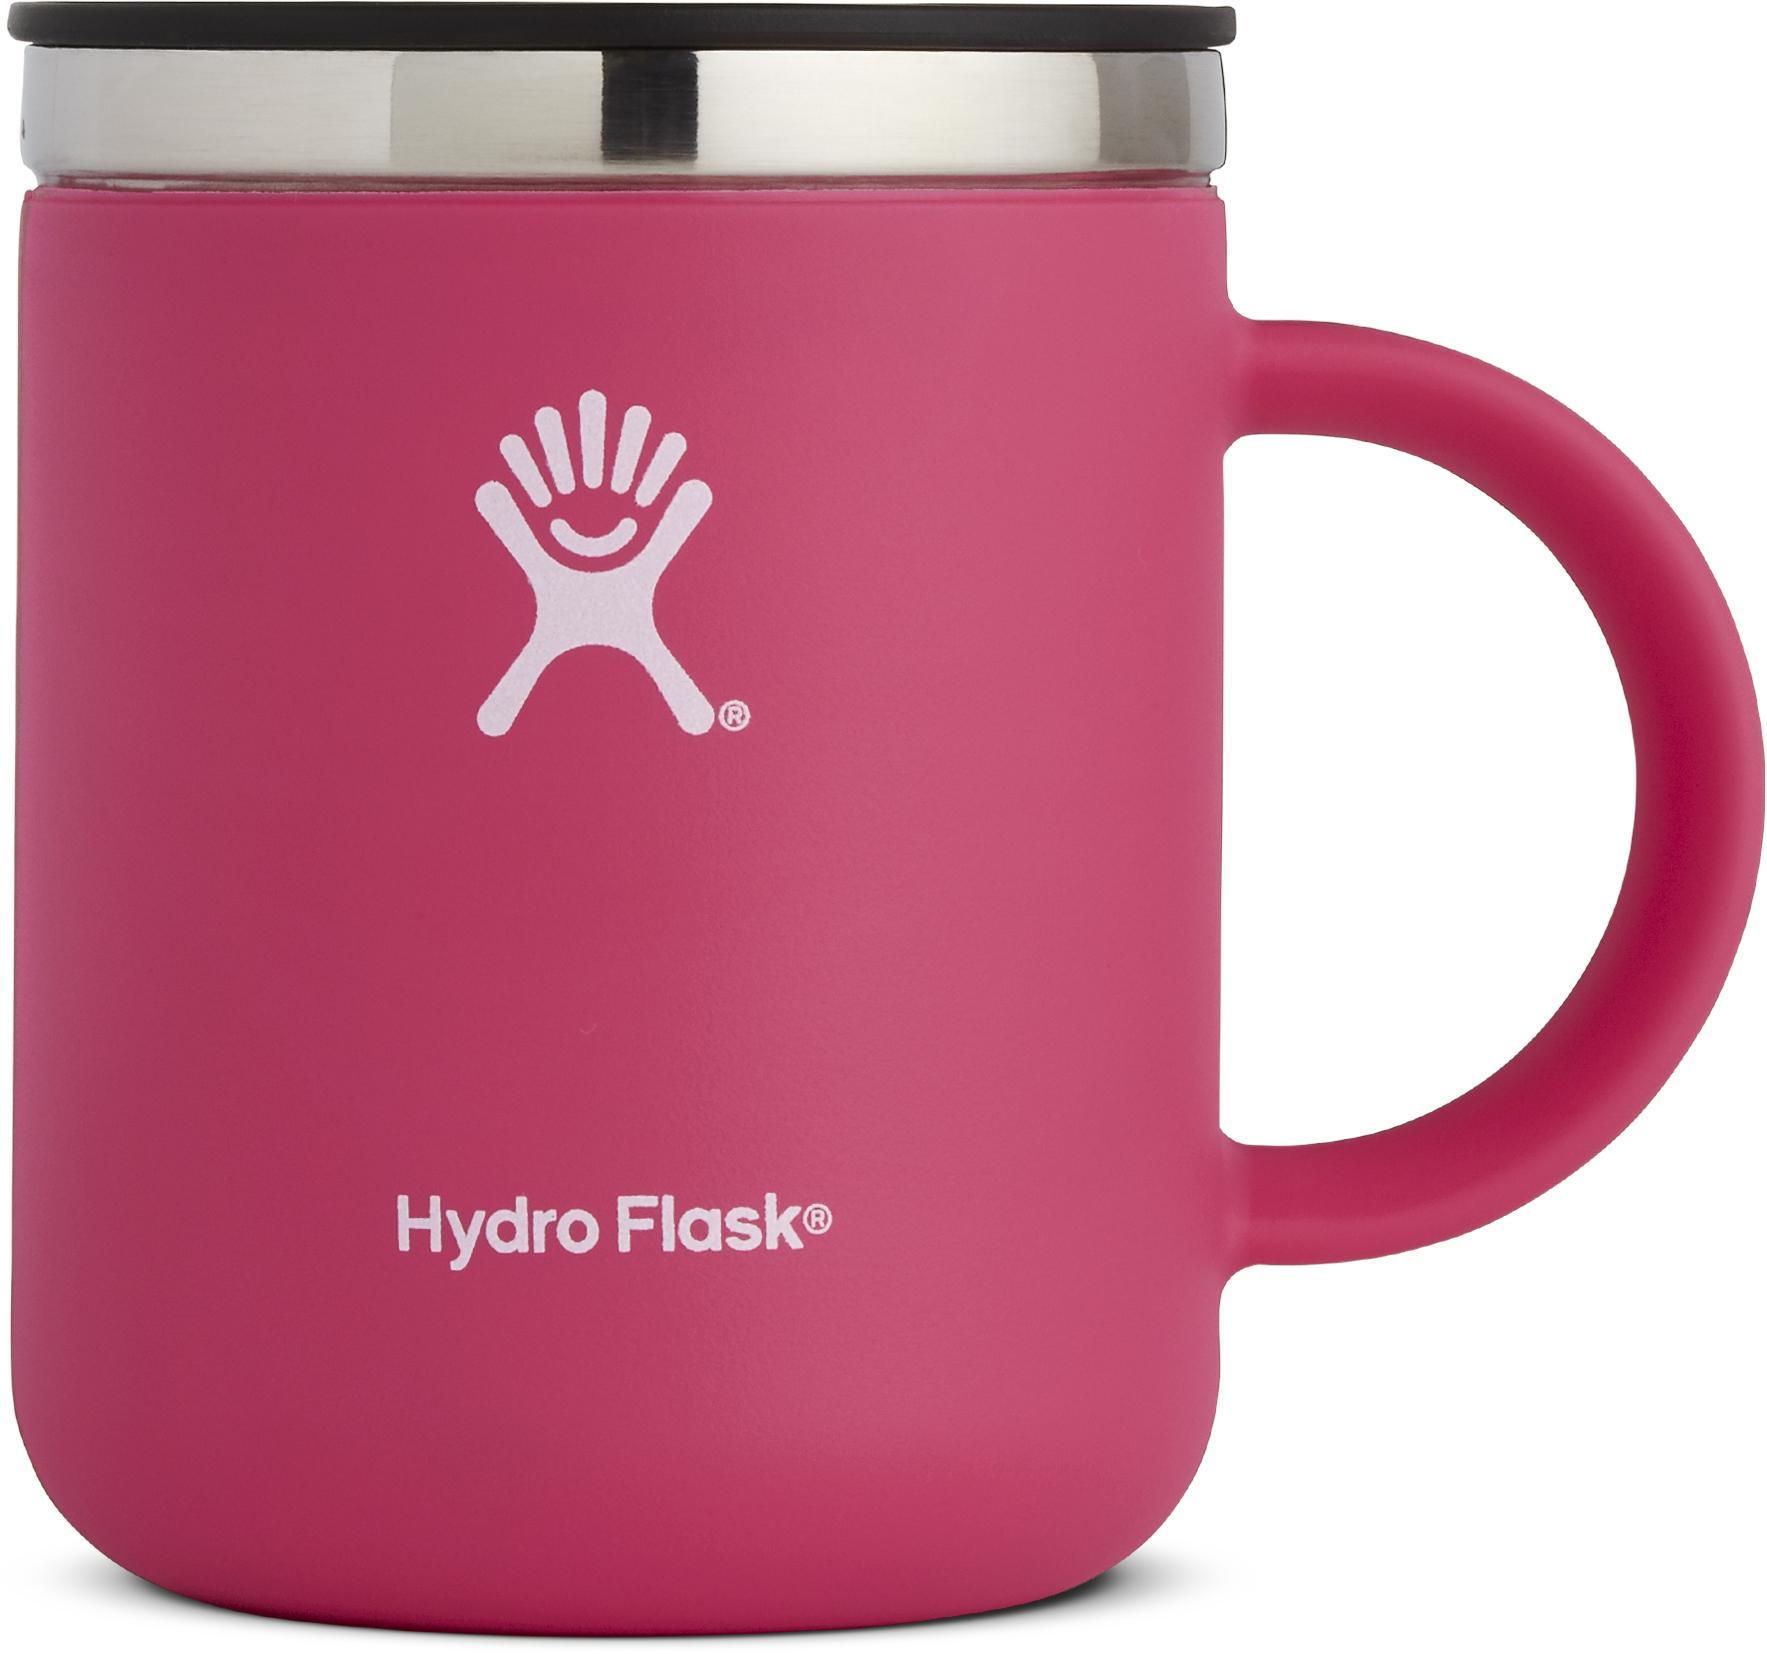 Hydro flask coffee mug 354ml mec